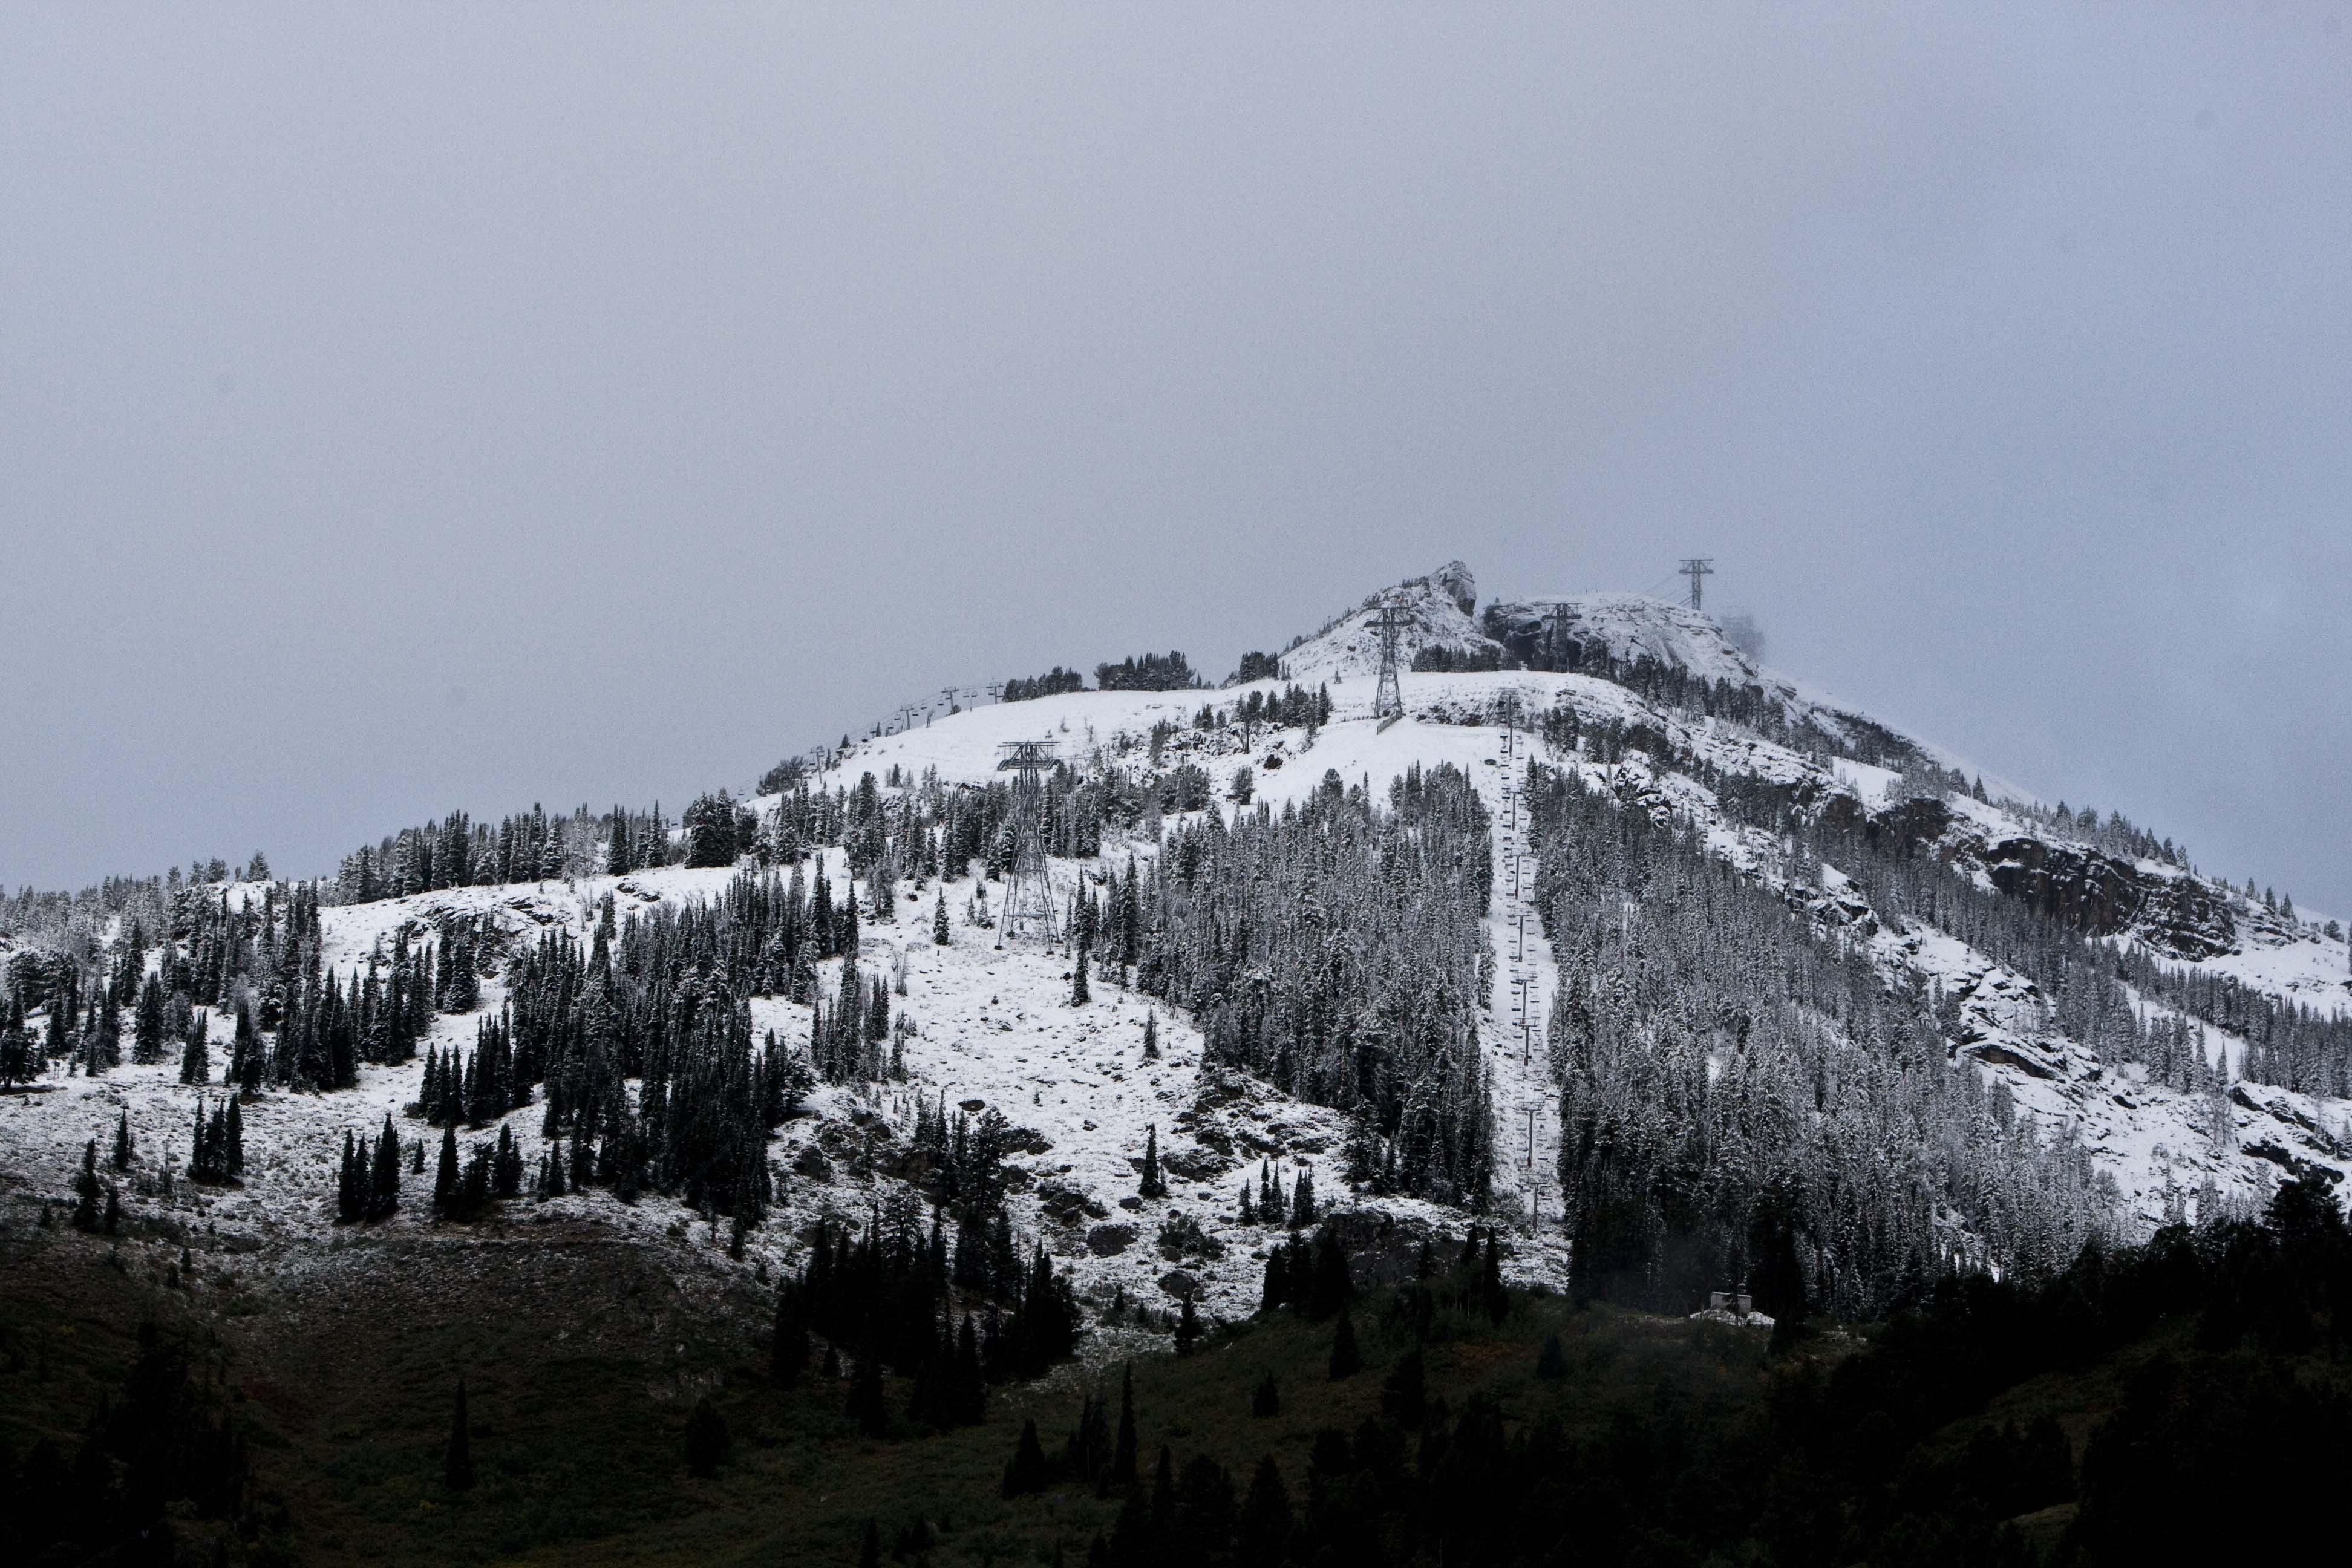 9/10 SNOW